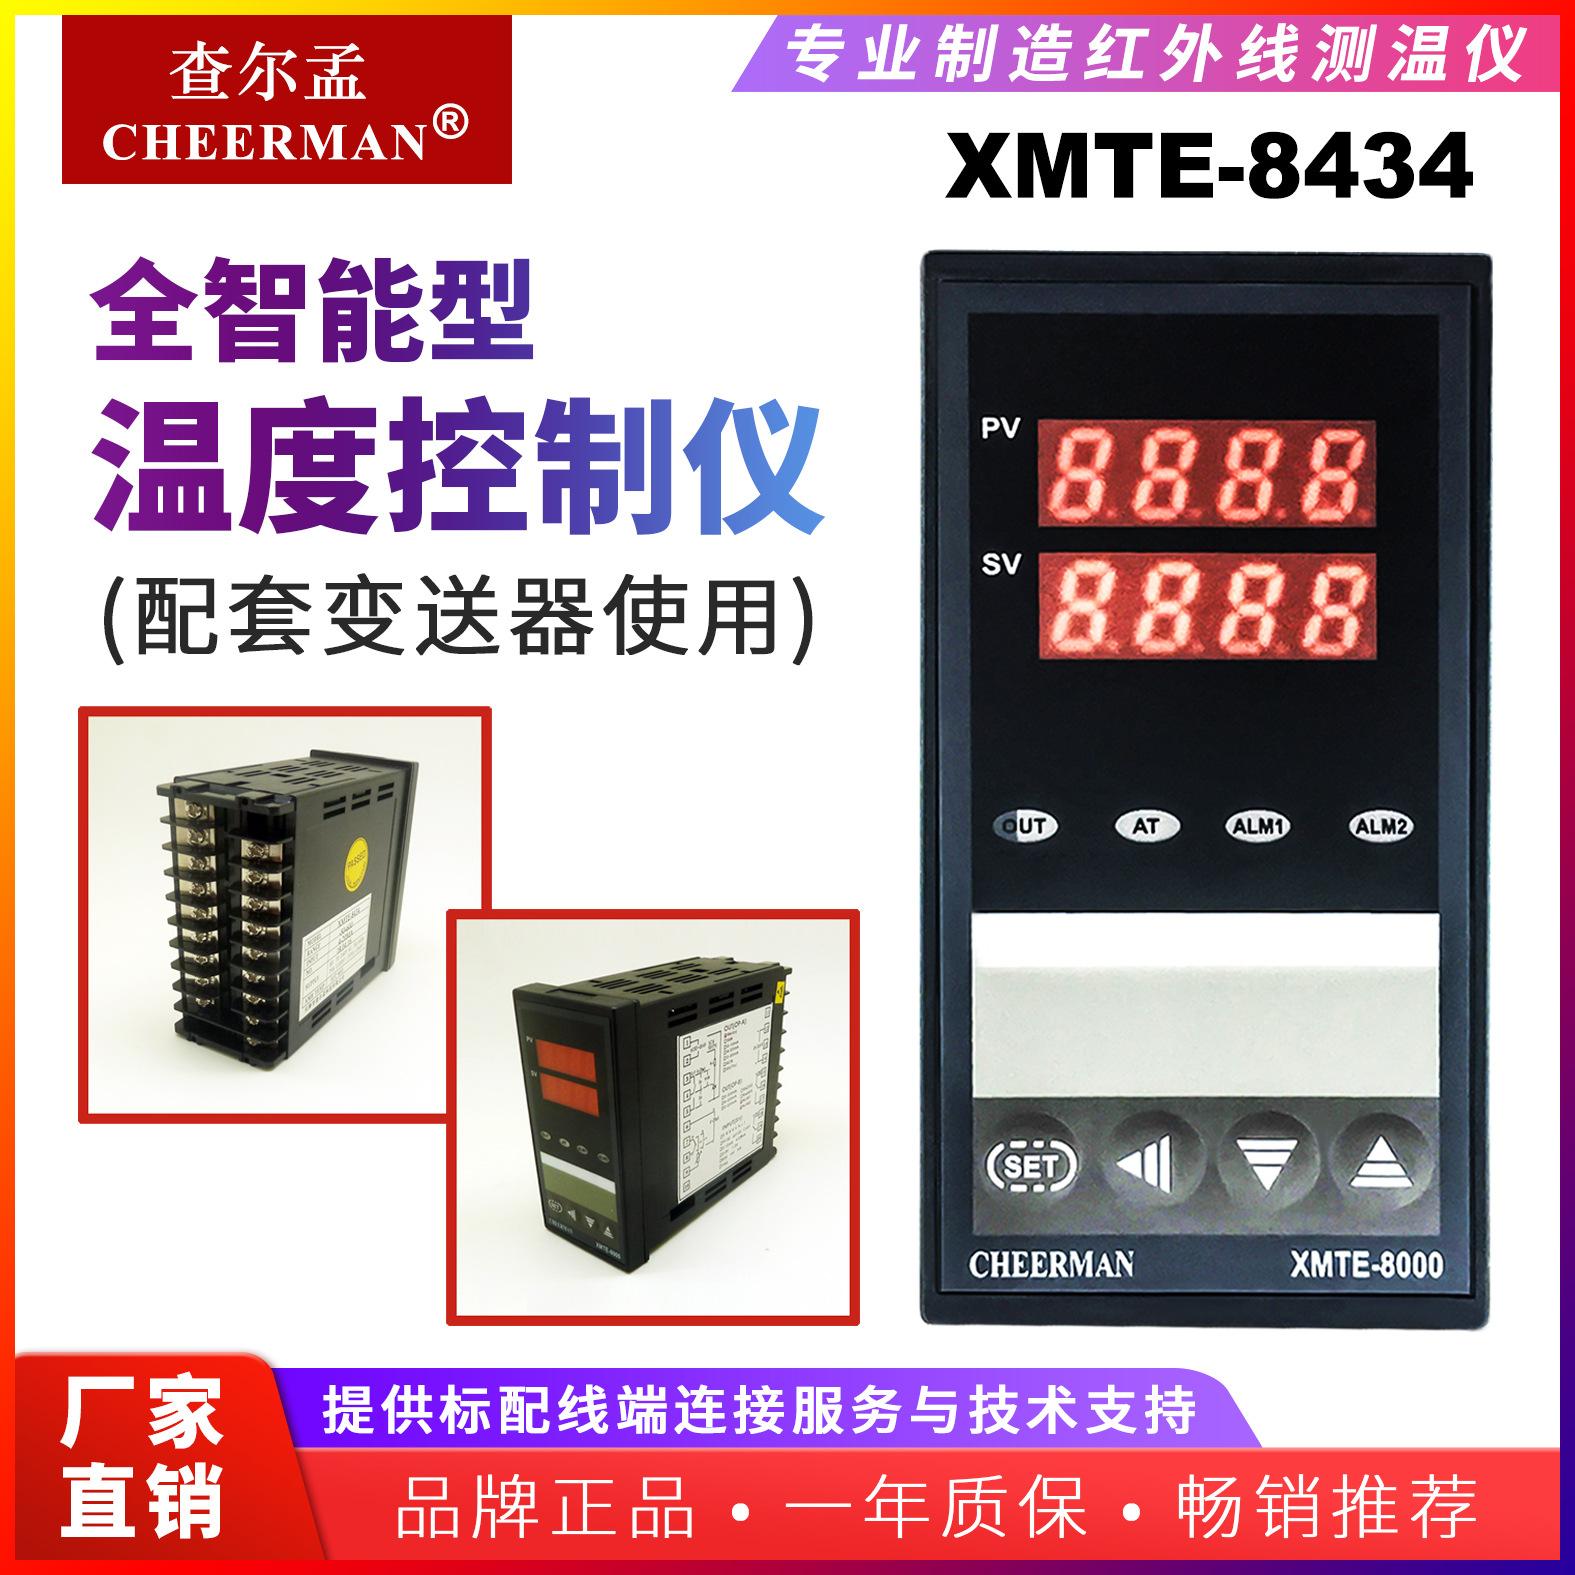 CHEERMAN/XMTE-8434智能控制器 PID继电器固态移向触发可控硅电流